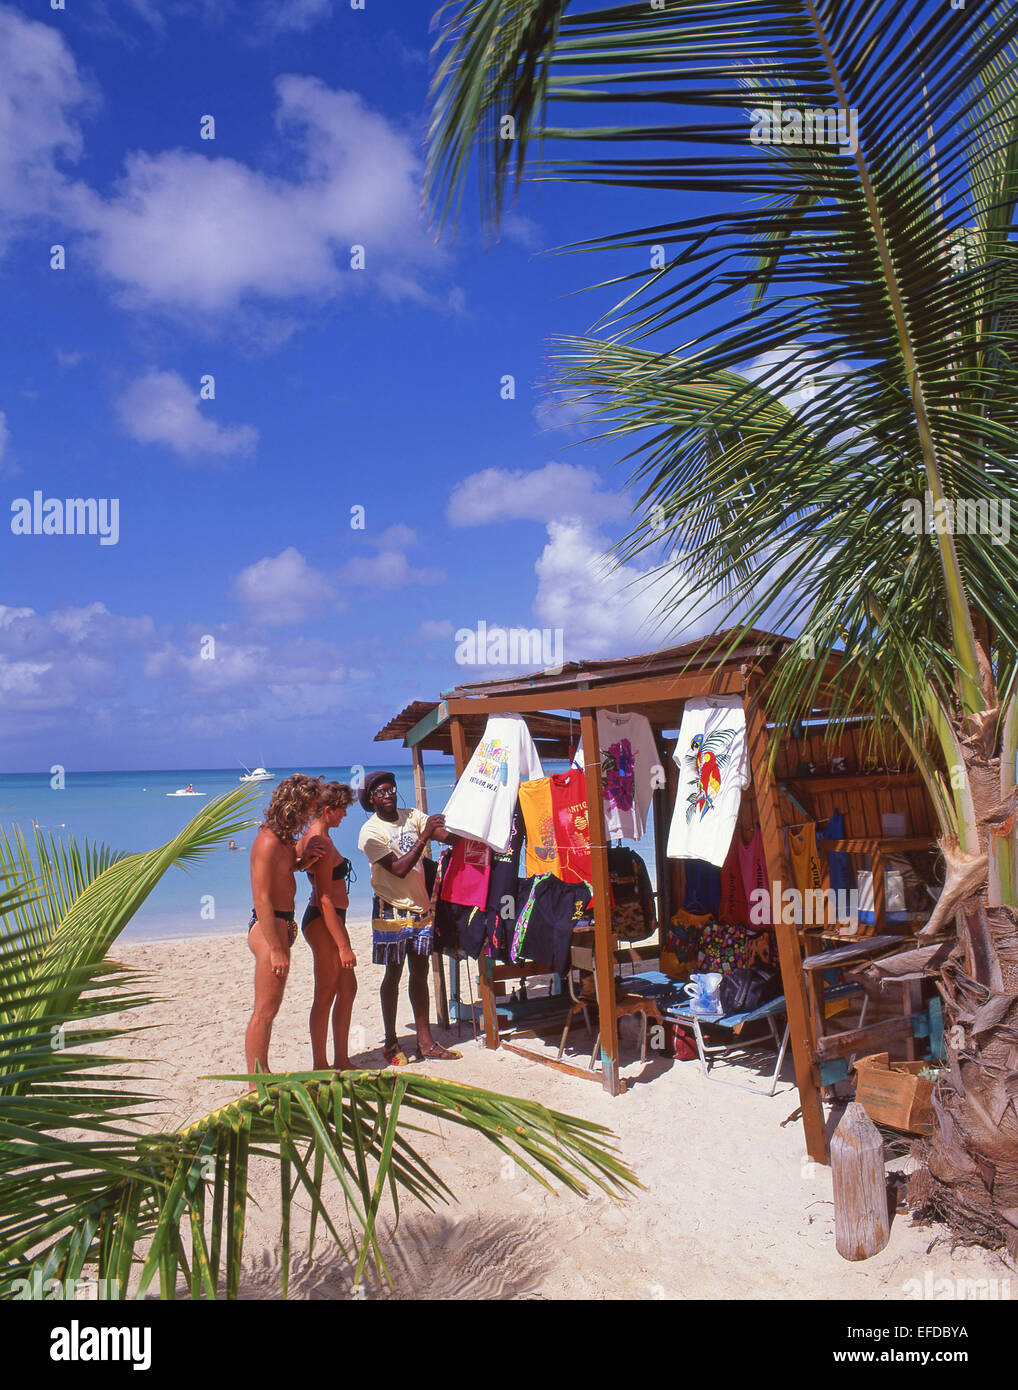 Beach art stall, Jolly Beach Resort & Spa, Saint Mary's Parish, Antigua, Antigua and Barbuda, Lesser Antilles, - Stock Image